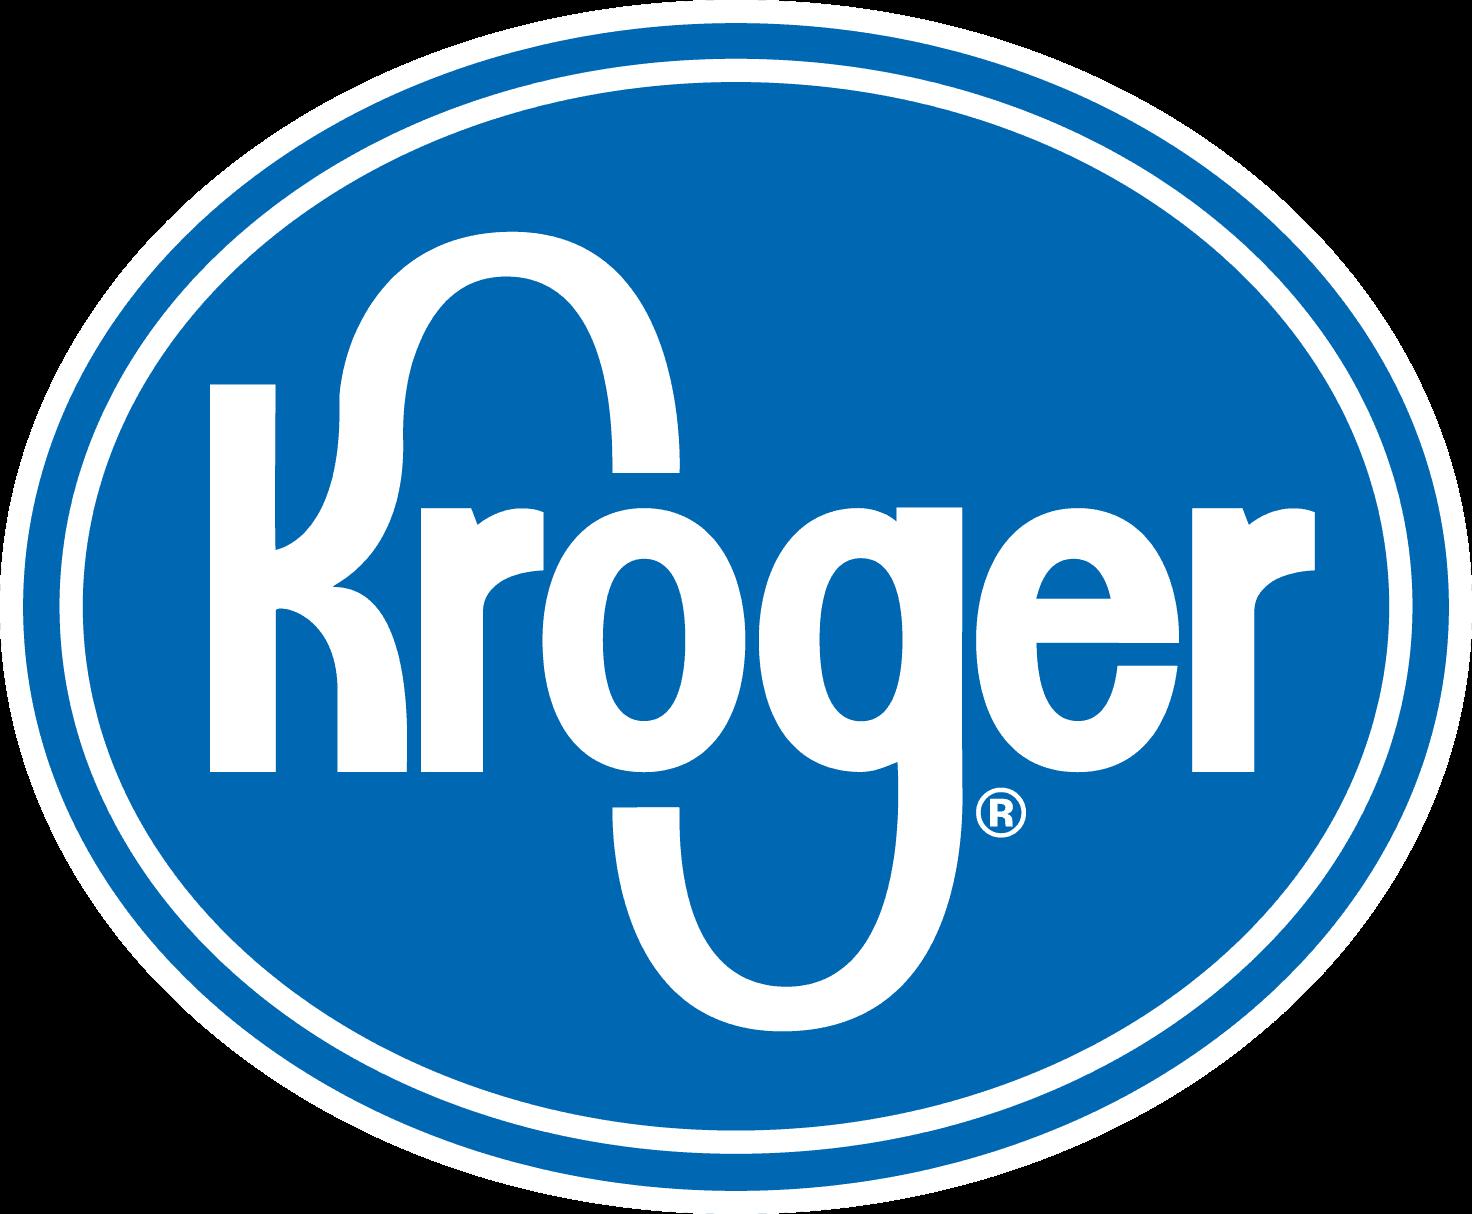 Kroger logo.